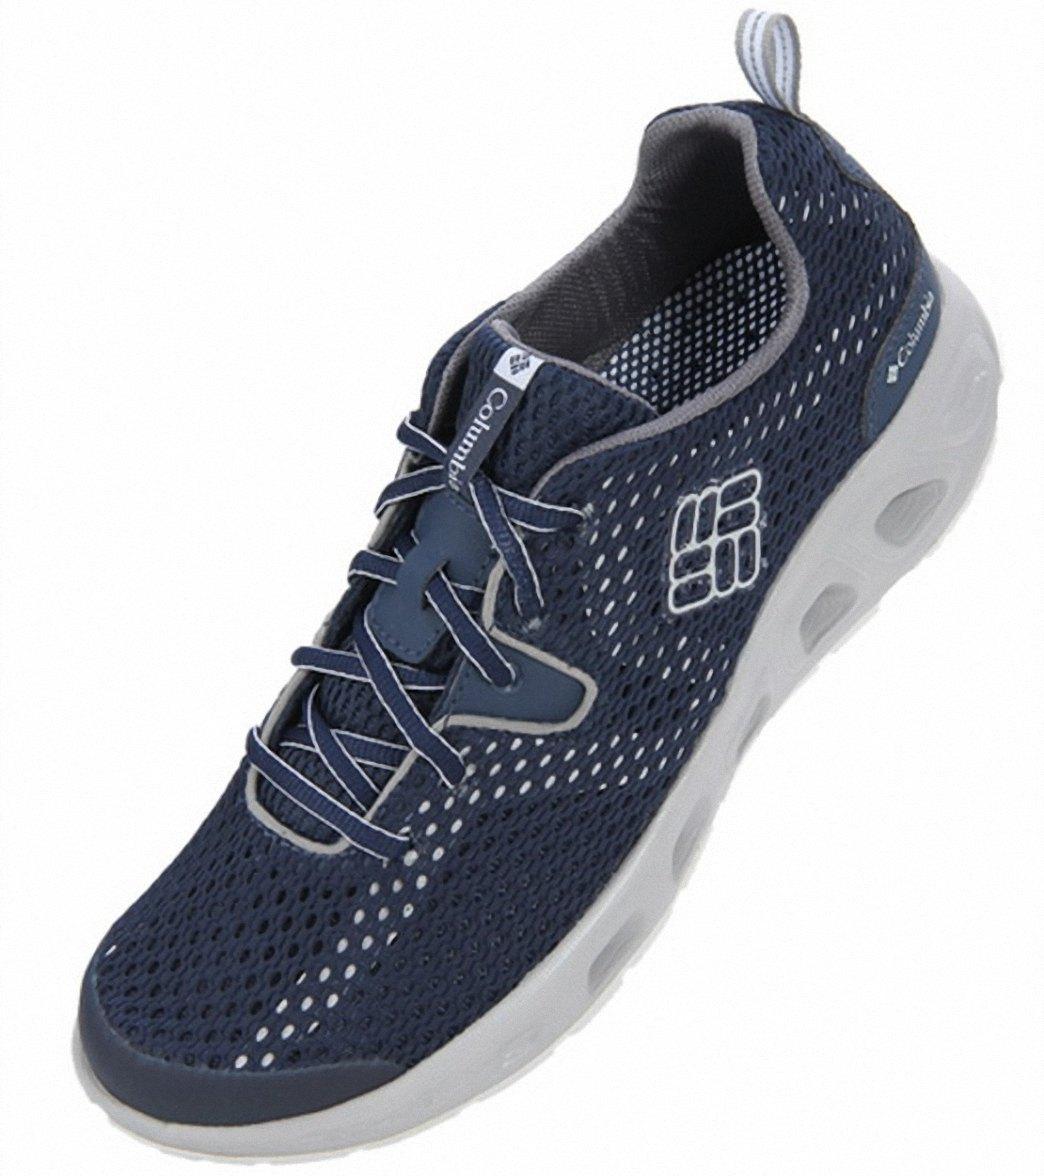 35d762fc2b90 Columbia Men s Drainmaker II PFG Water Shoes